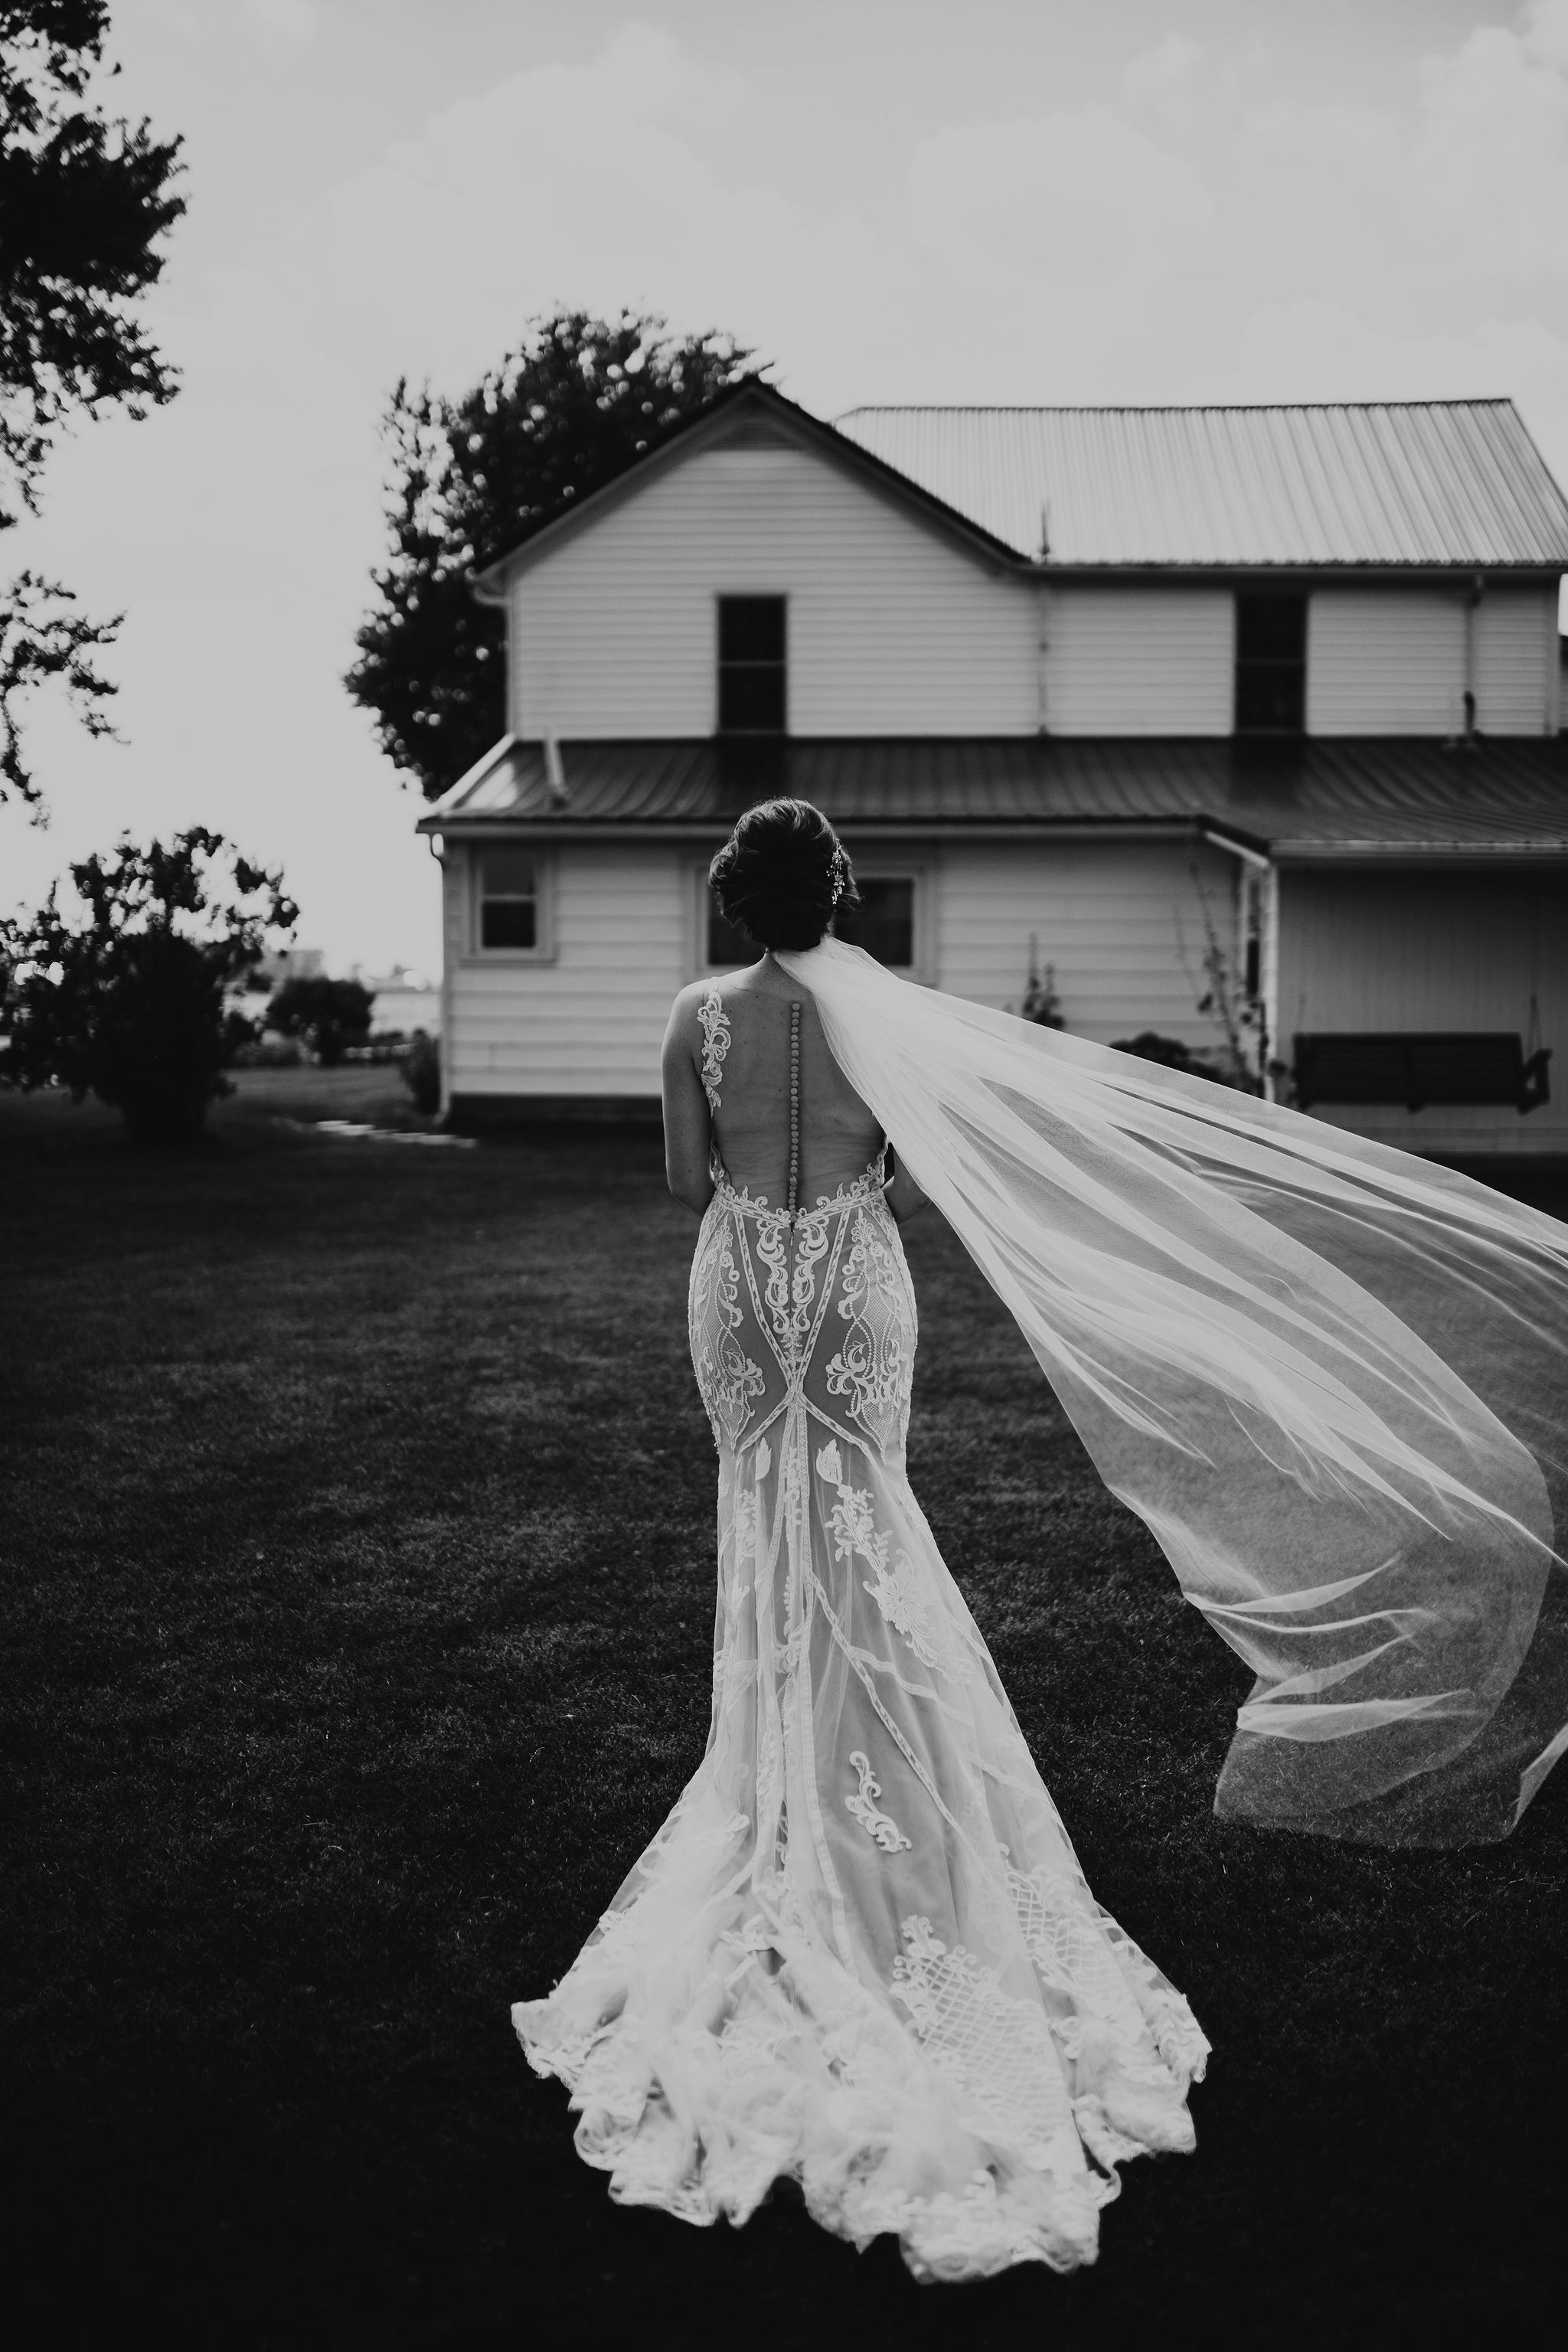 Dayton Ohio Wedding Photography Videography By Christina Amp Jeremiah In 2020 Wedding Barn Wedding Photos Wedding Photography And Videography